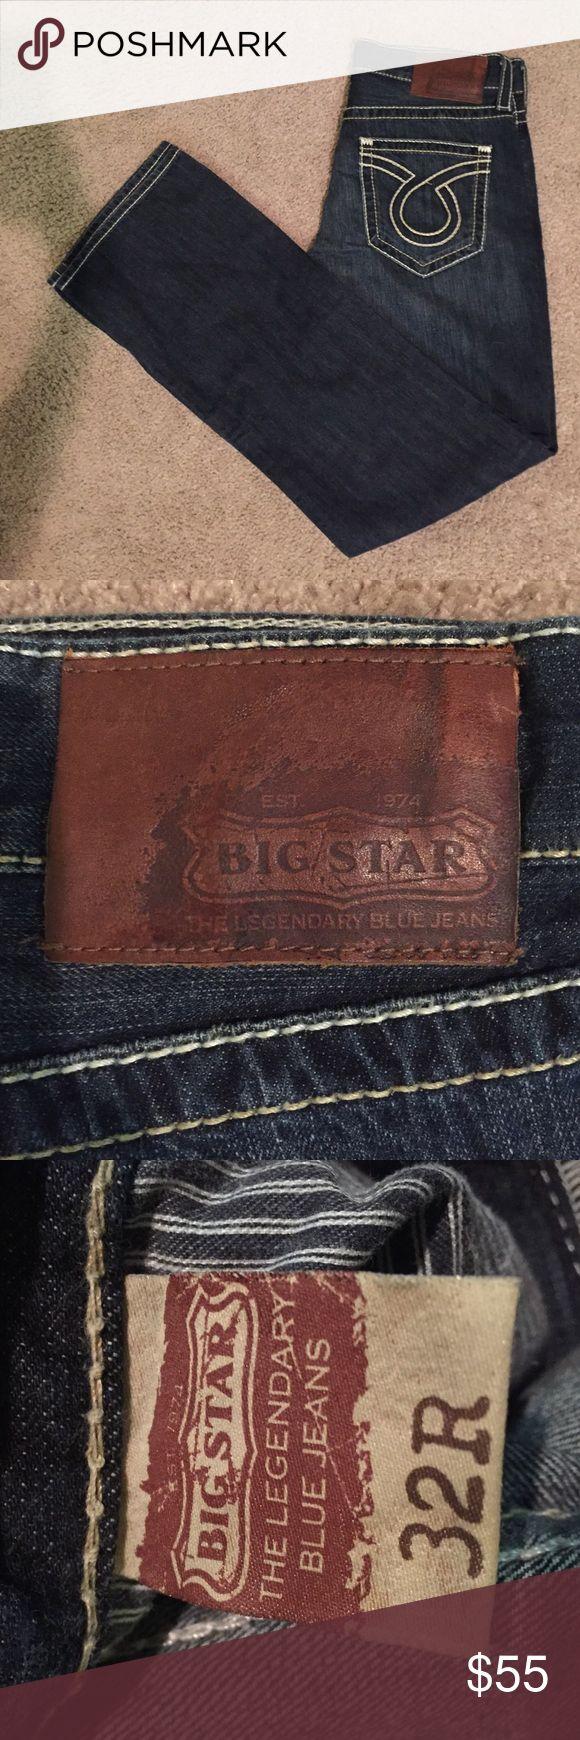 NWOT Men's Big Star Jeans Mens designer boot cut jeans Big Star Jeans Bootcut